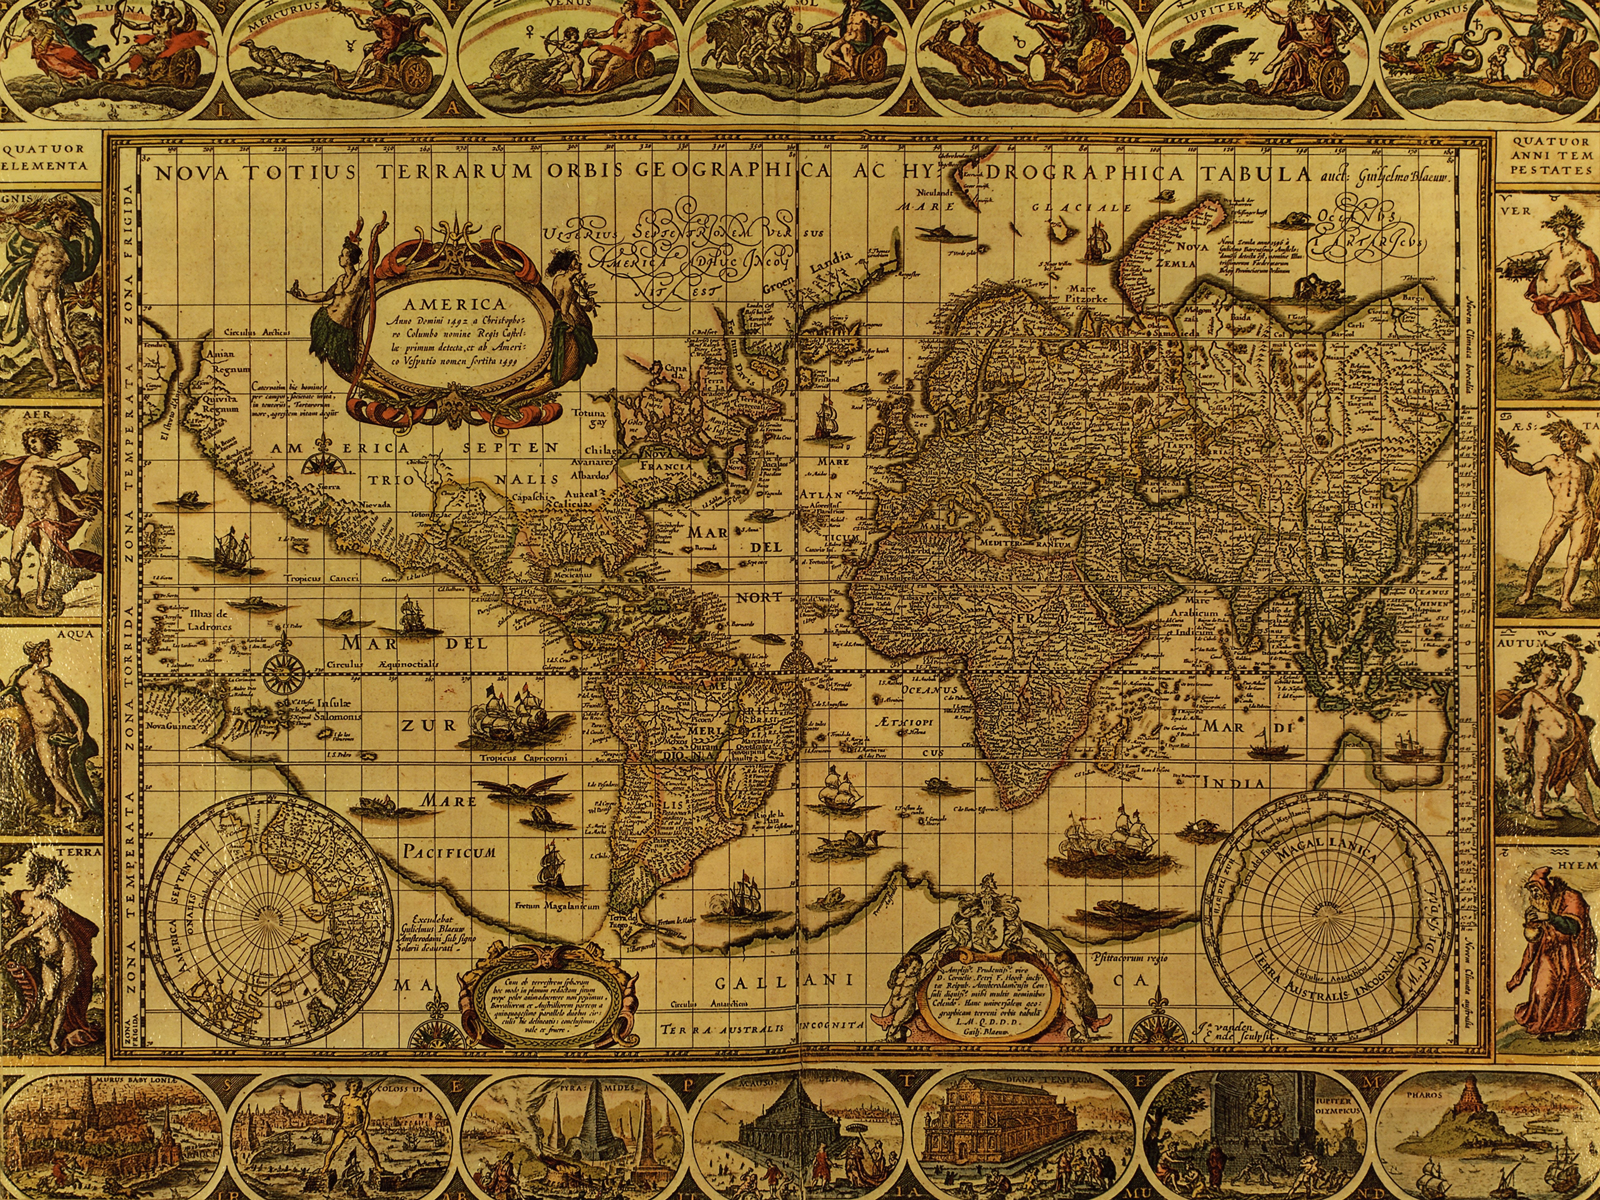 Mapas Antiguos Para Imprimir O Curiosear (+60). Old World MapsVintage ...